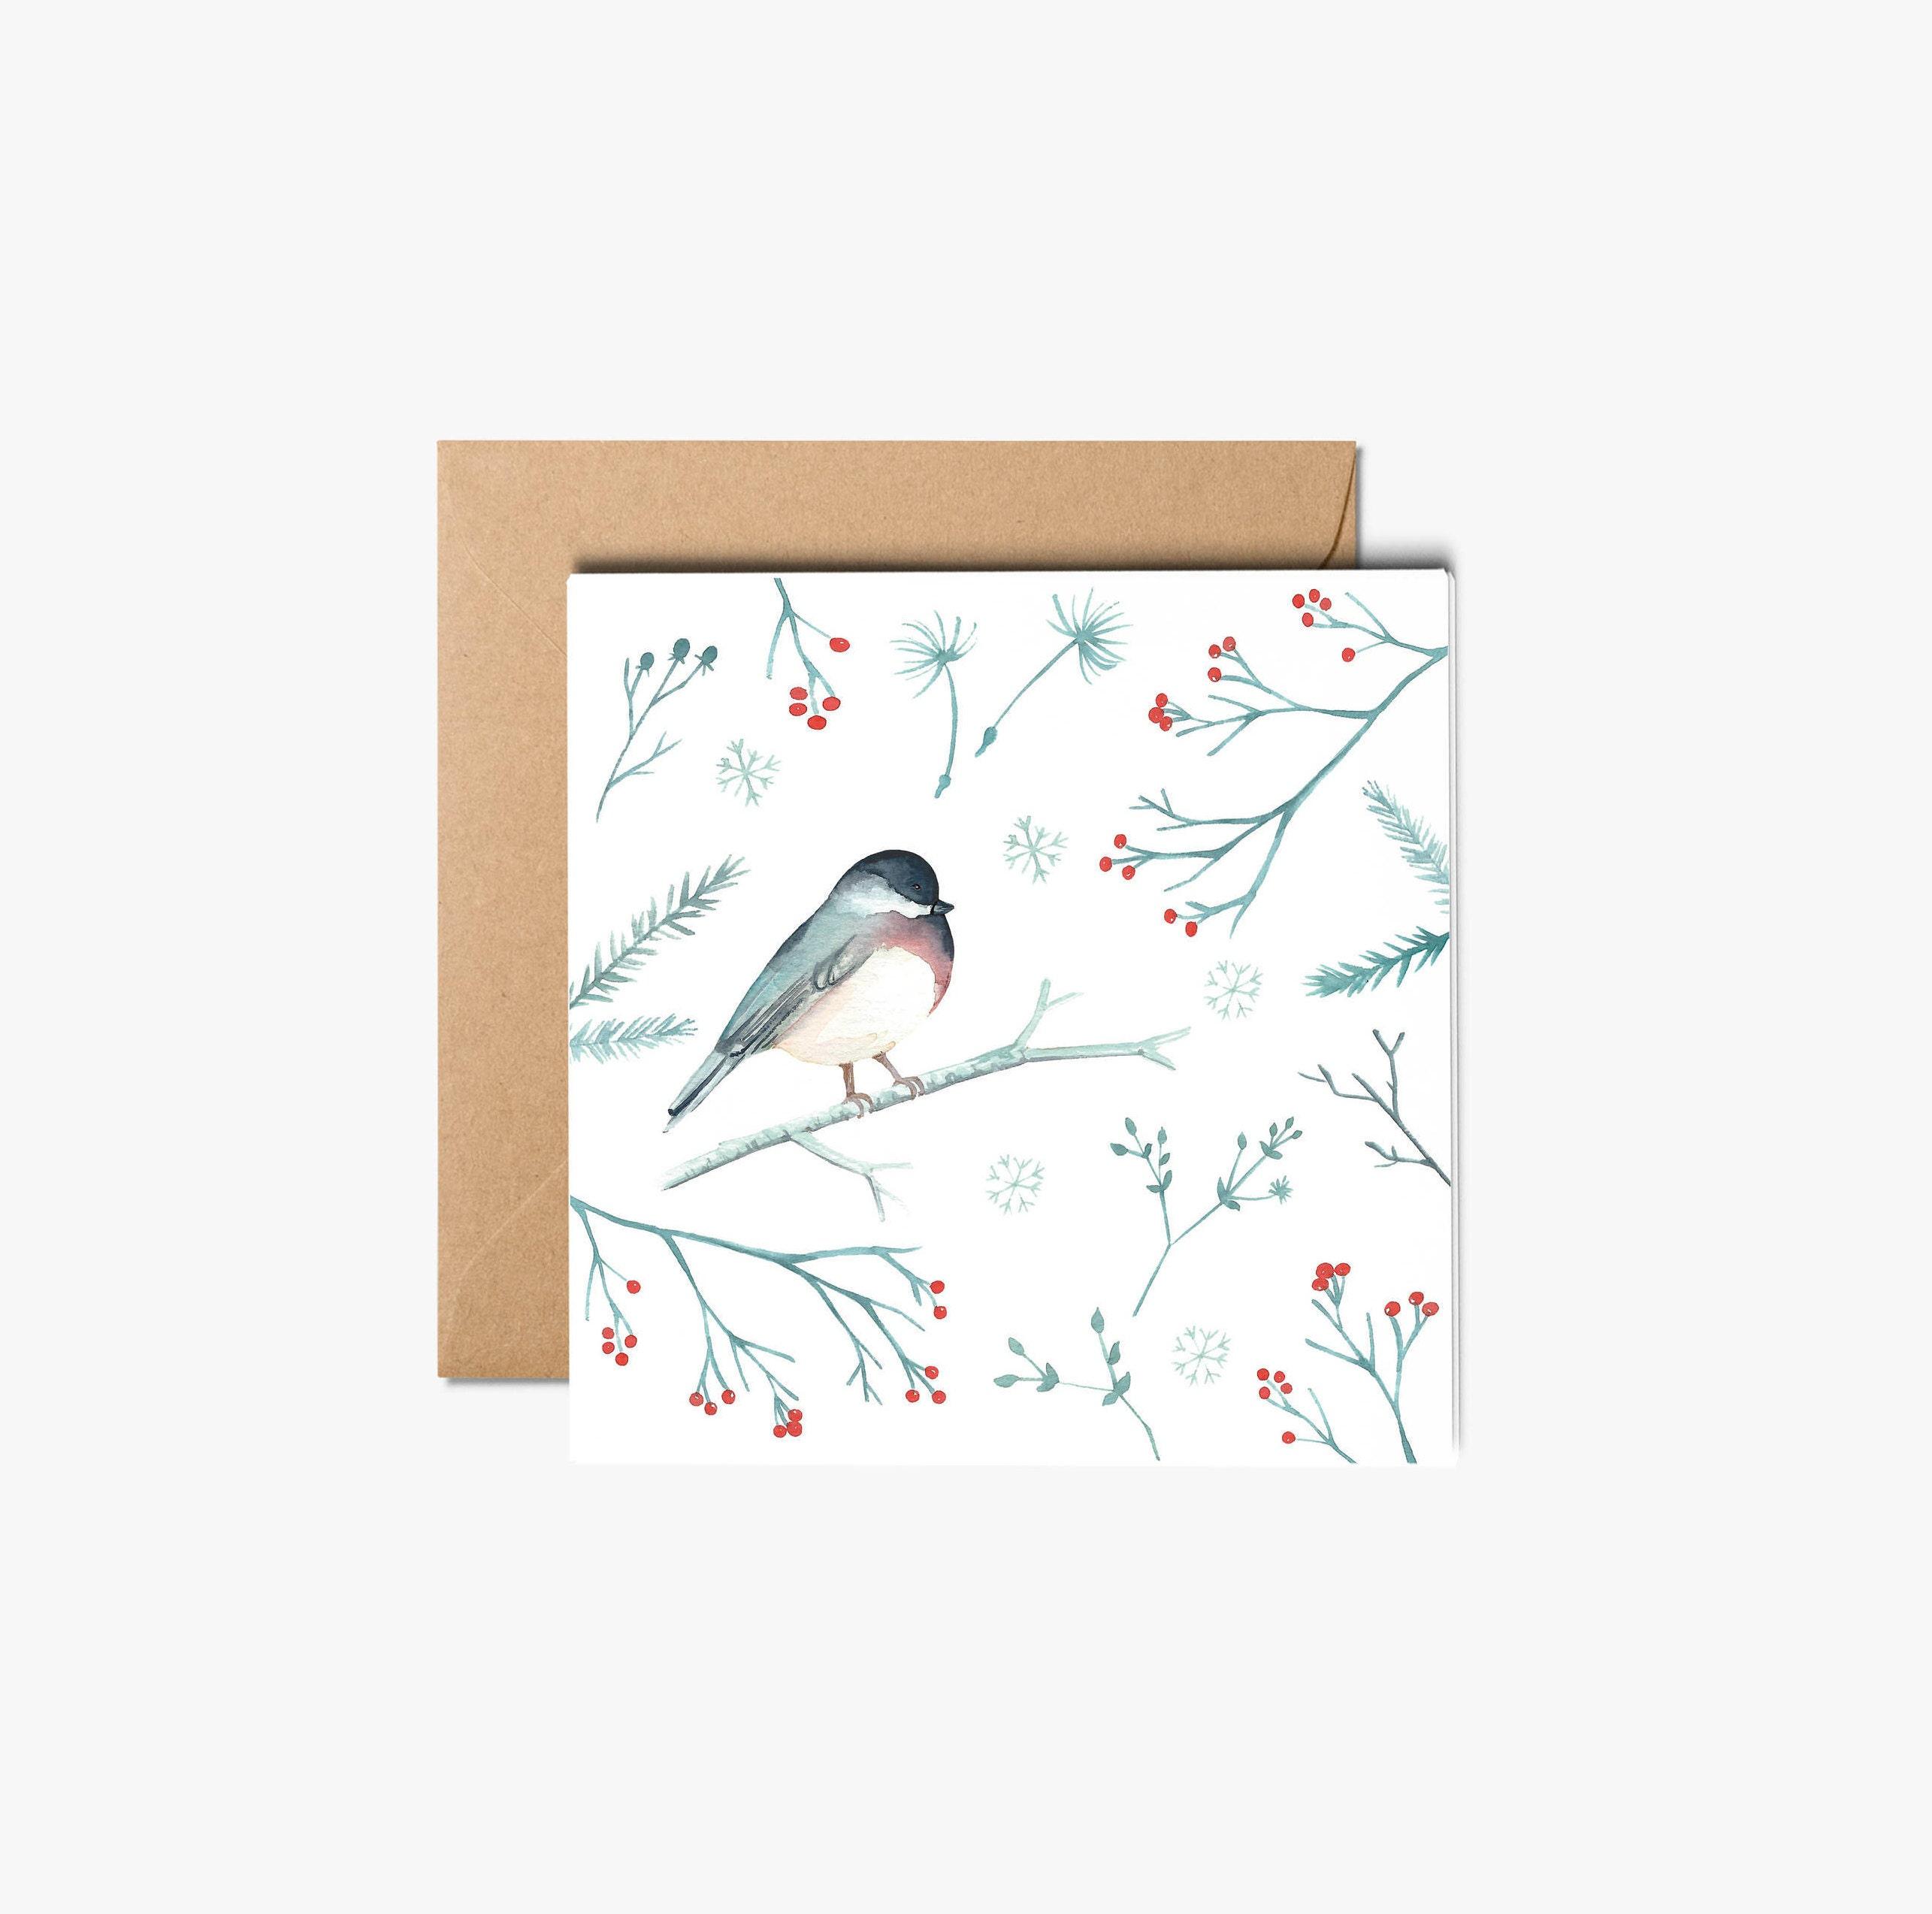 Christmas cards robin greeting card watercolor cards with envelope christmas cards robin greeting card watercolor cards with envelope holiday greeting card holiday card xmas card boxed christmas cards kristyandbryce Choice Image